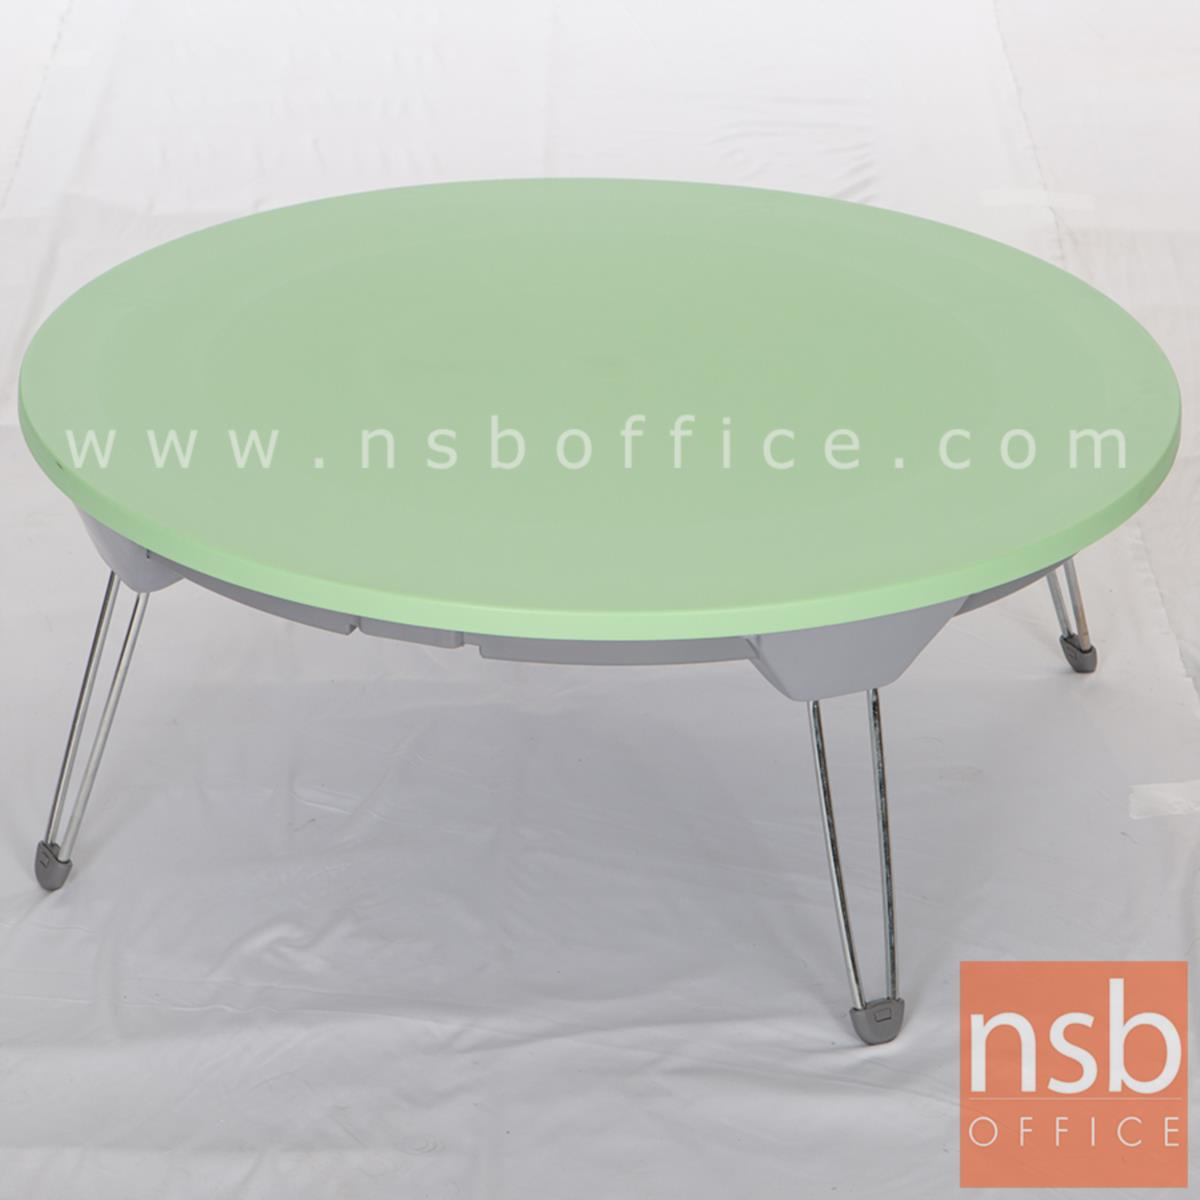 A19A049:โต๊ะญี่ปุ่นทรงกลม รุ่น SACHSEN (ซัคเซน) ขนาด 80Di cm. ขาเหล็กชุบโครเมี่ยม